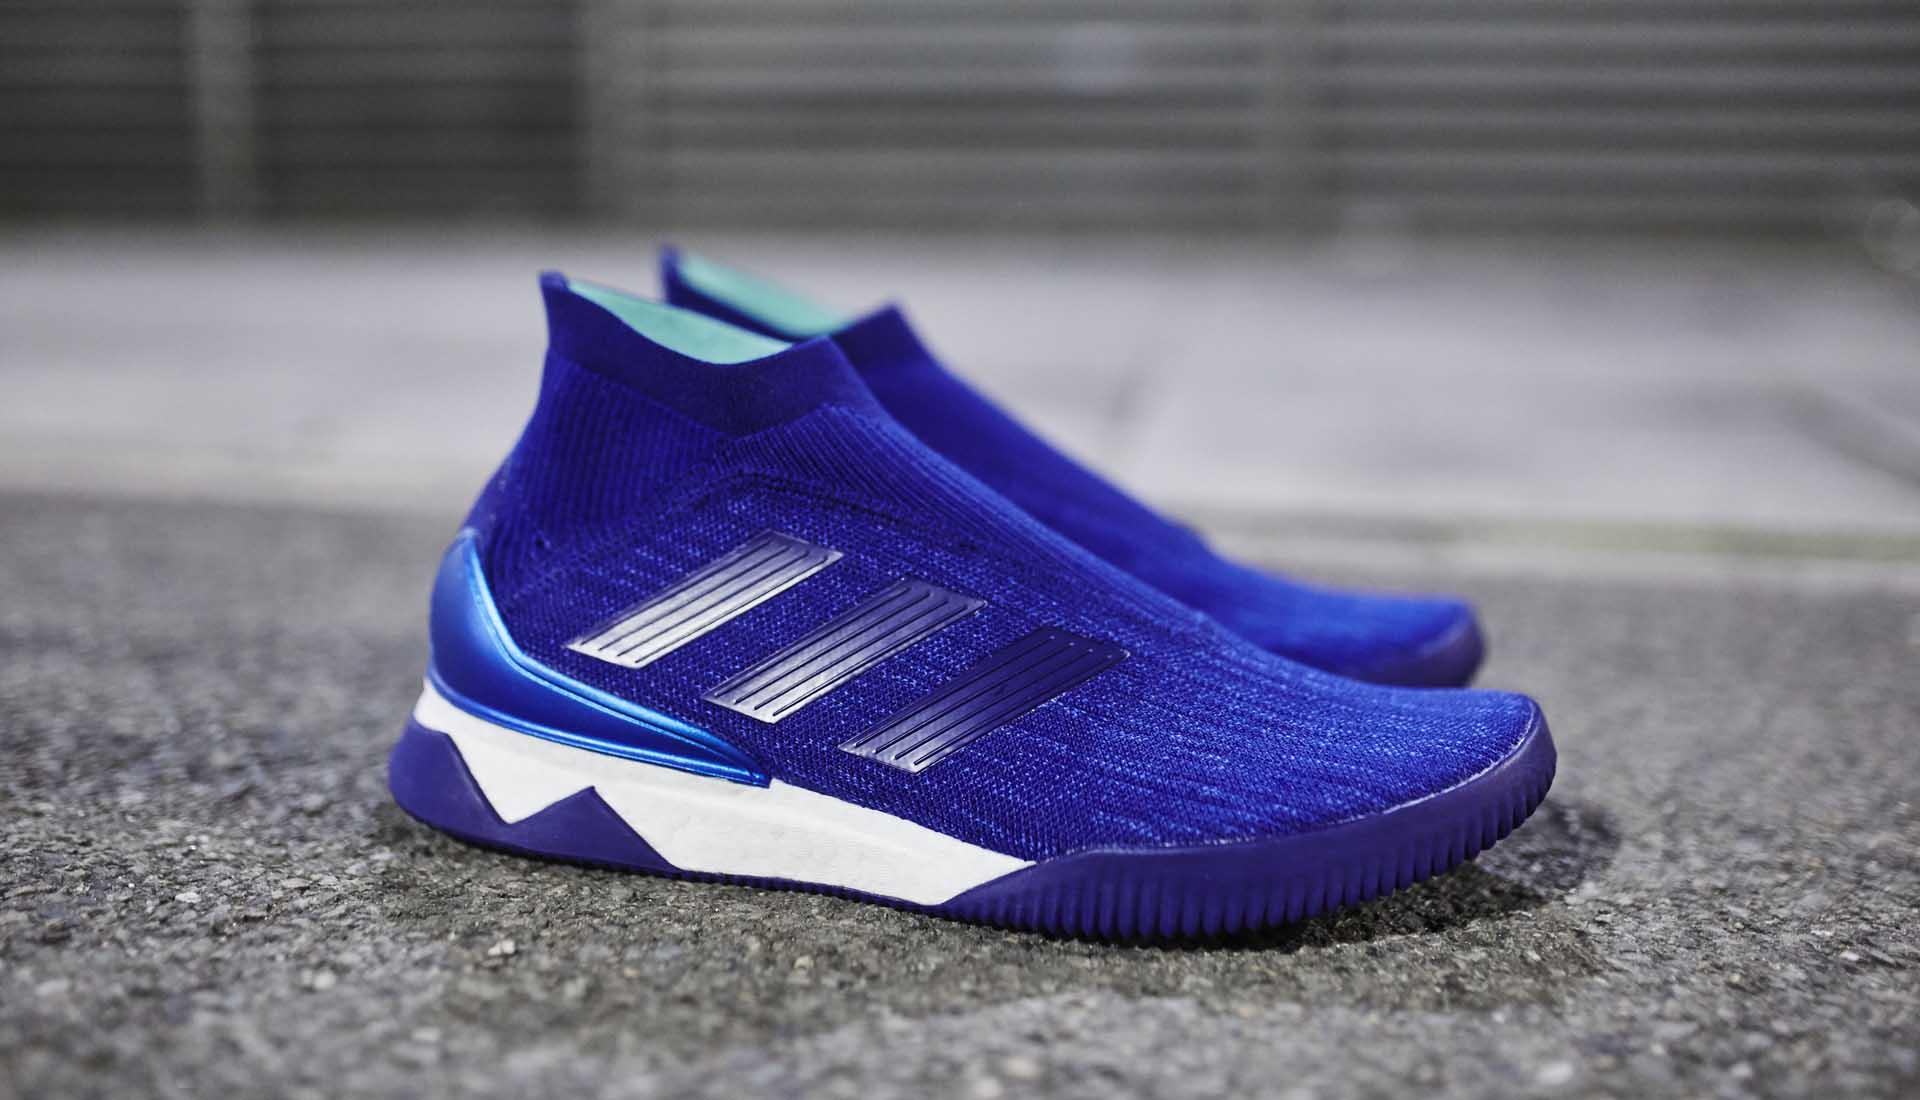 adidas predator ultra boost